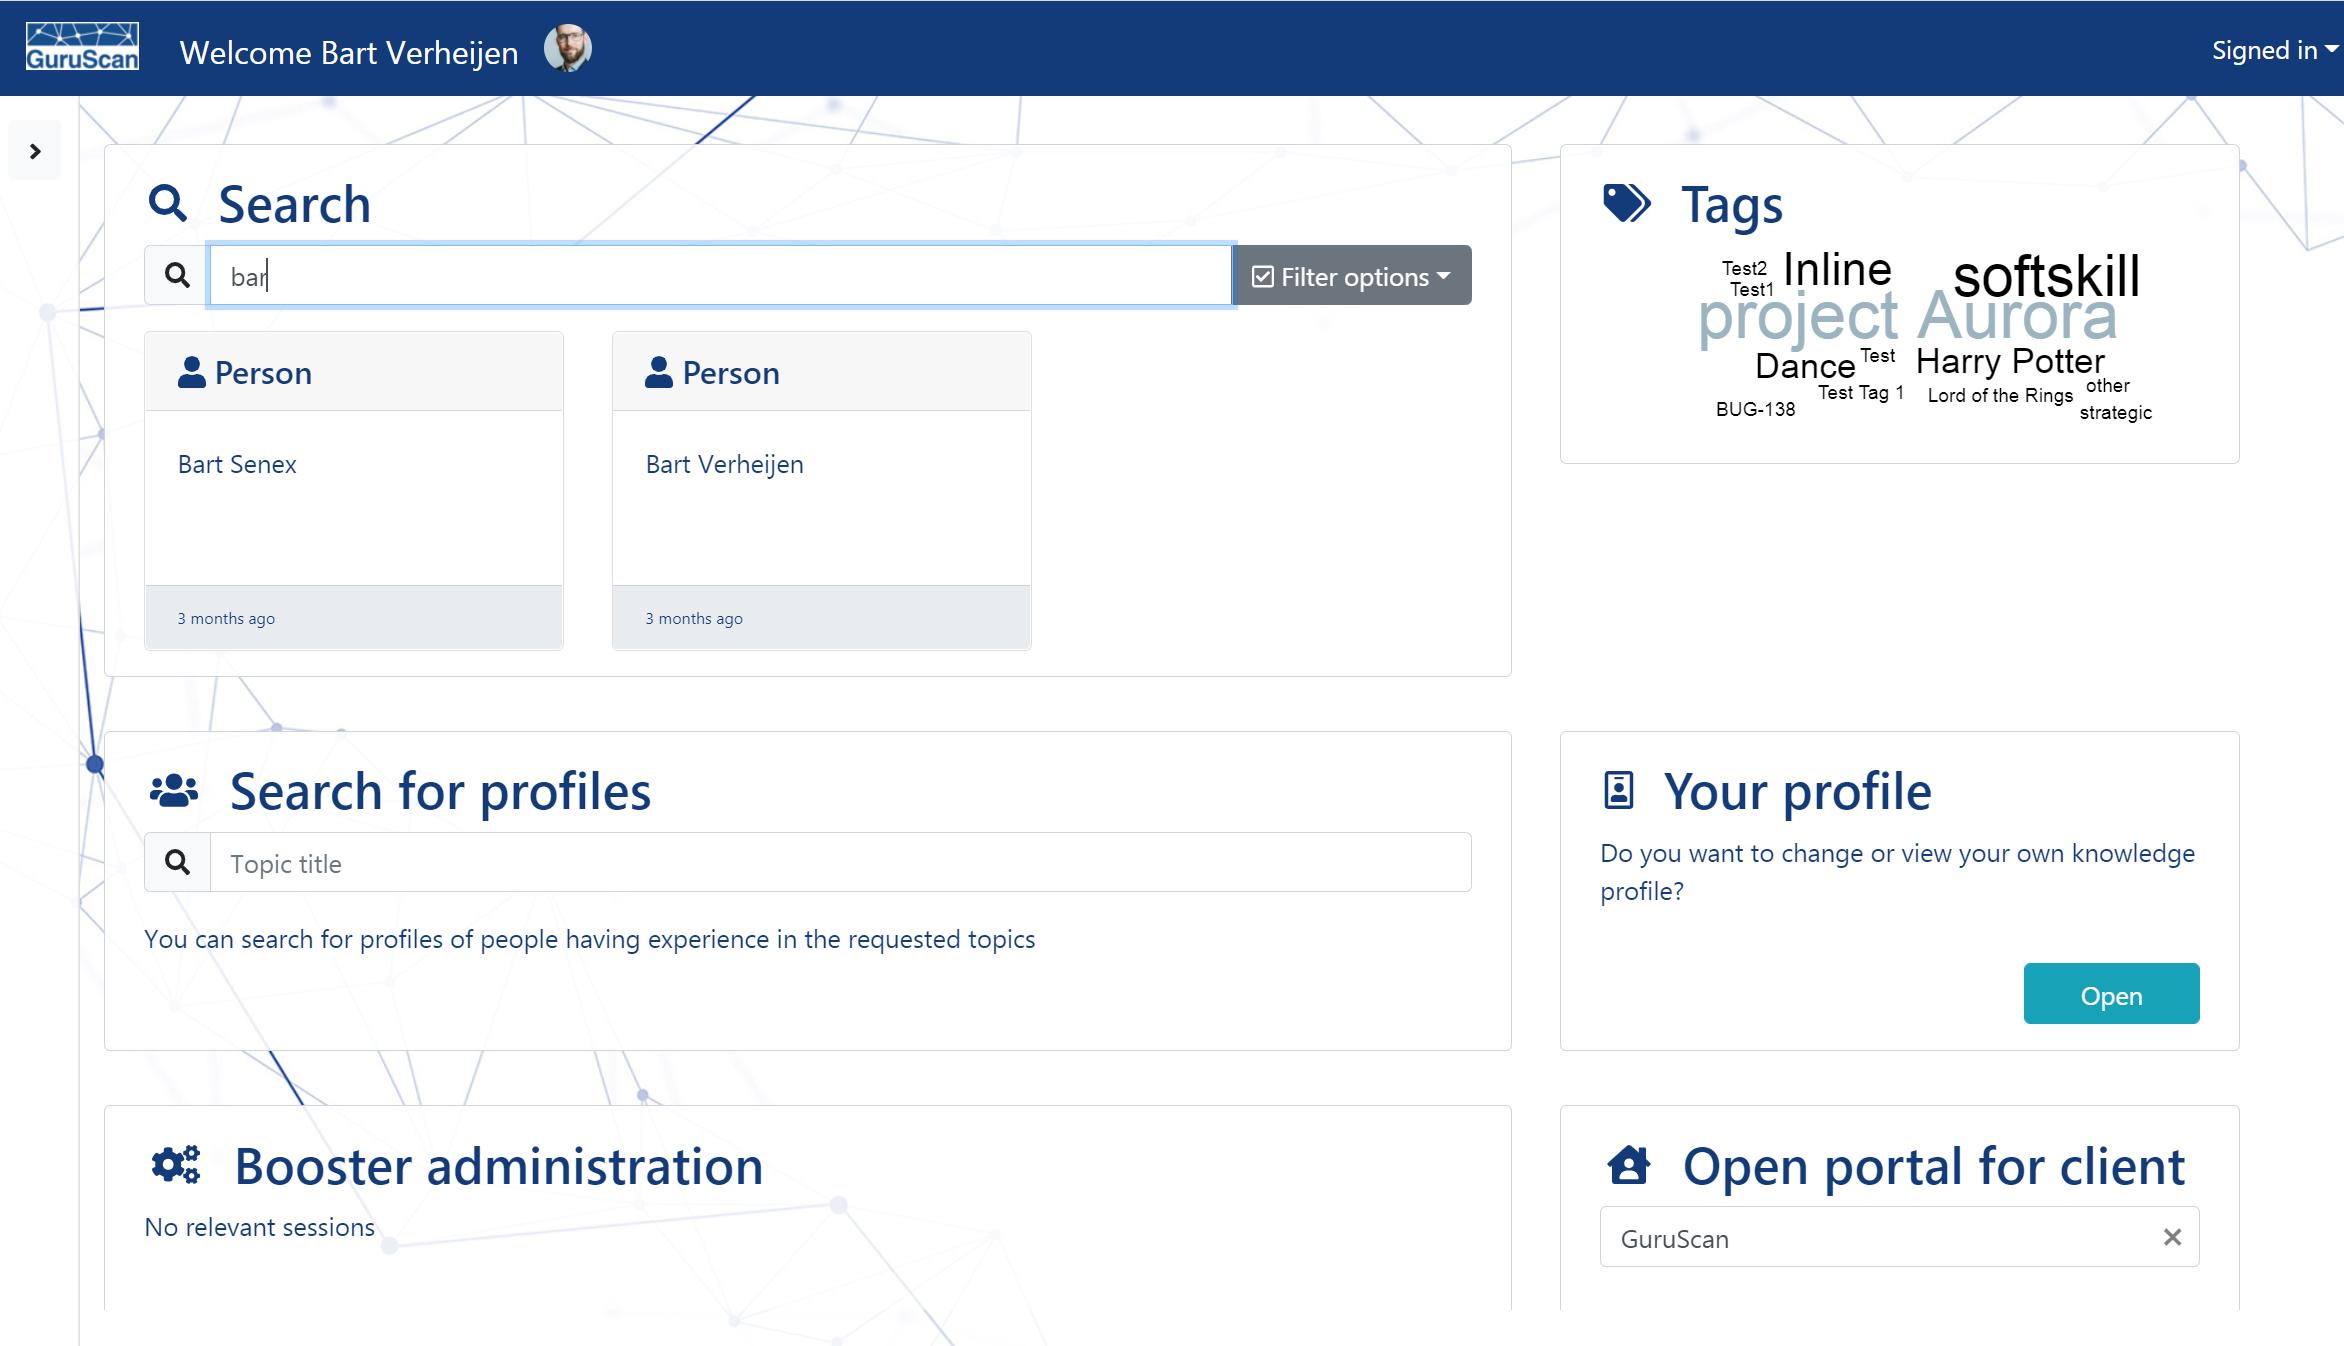 Dashboard of the GuruScan application